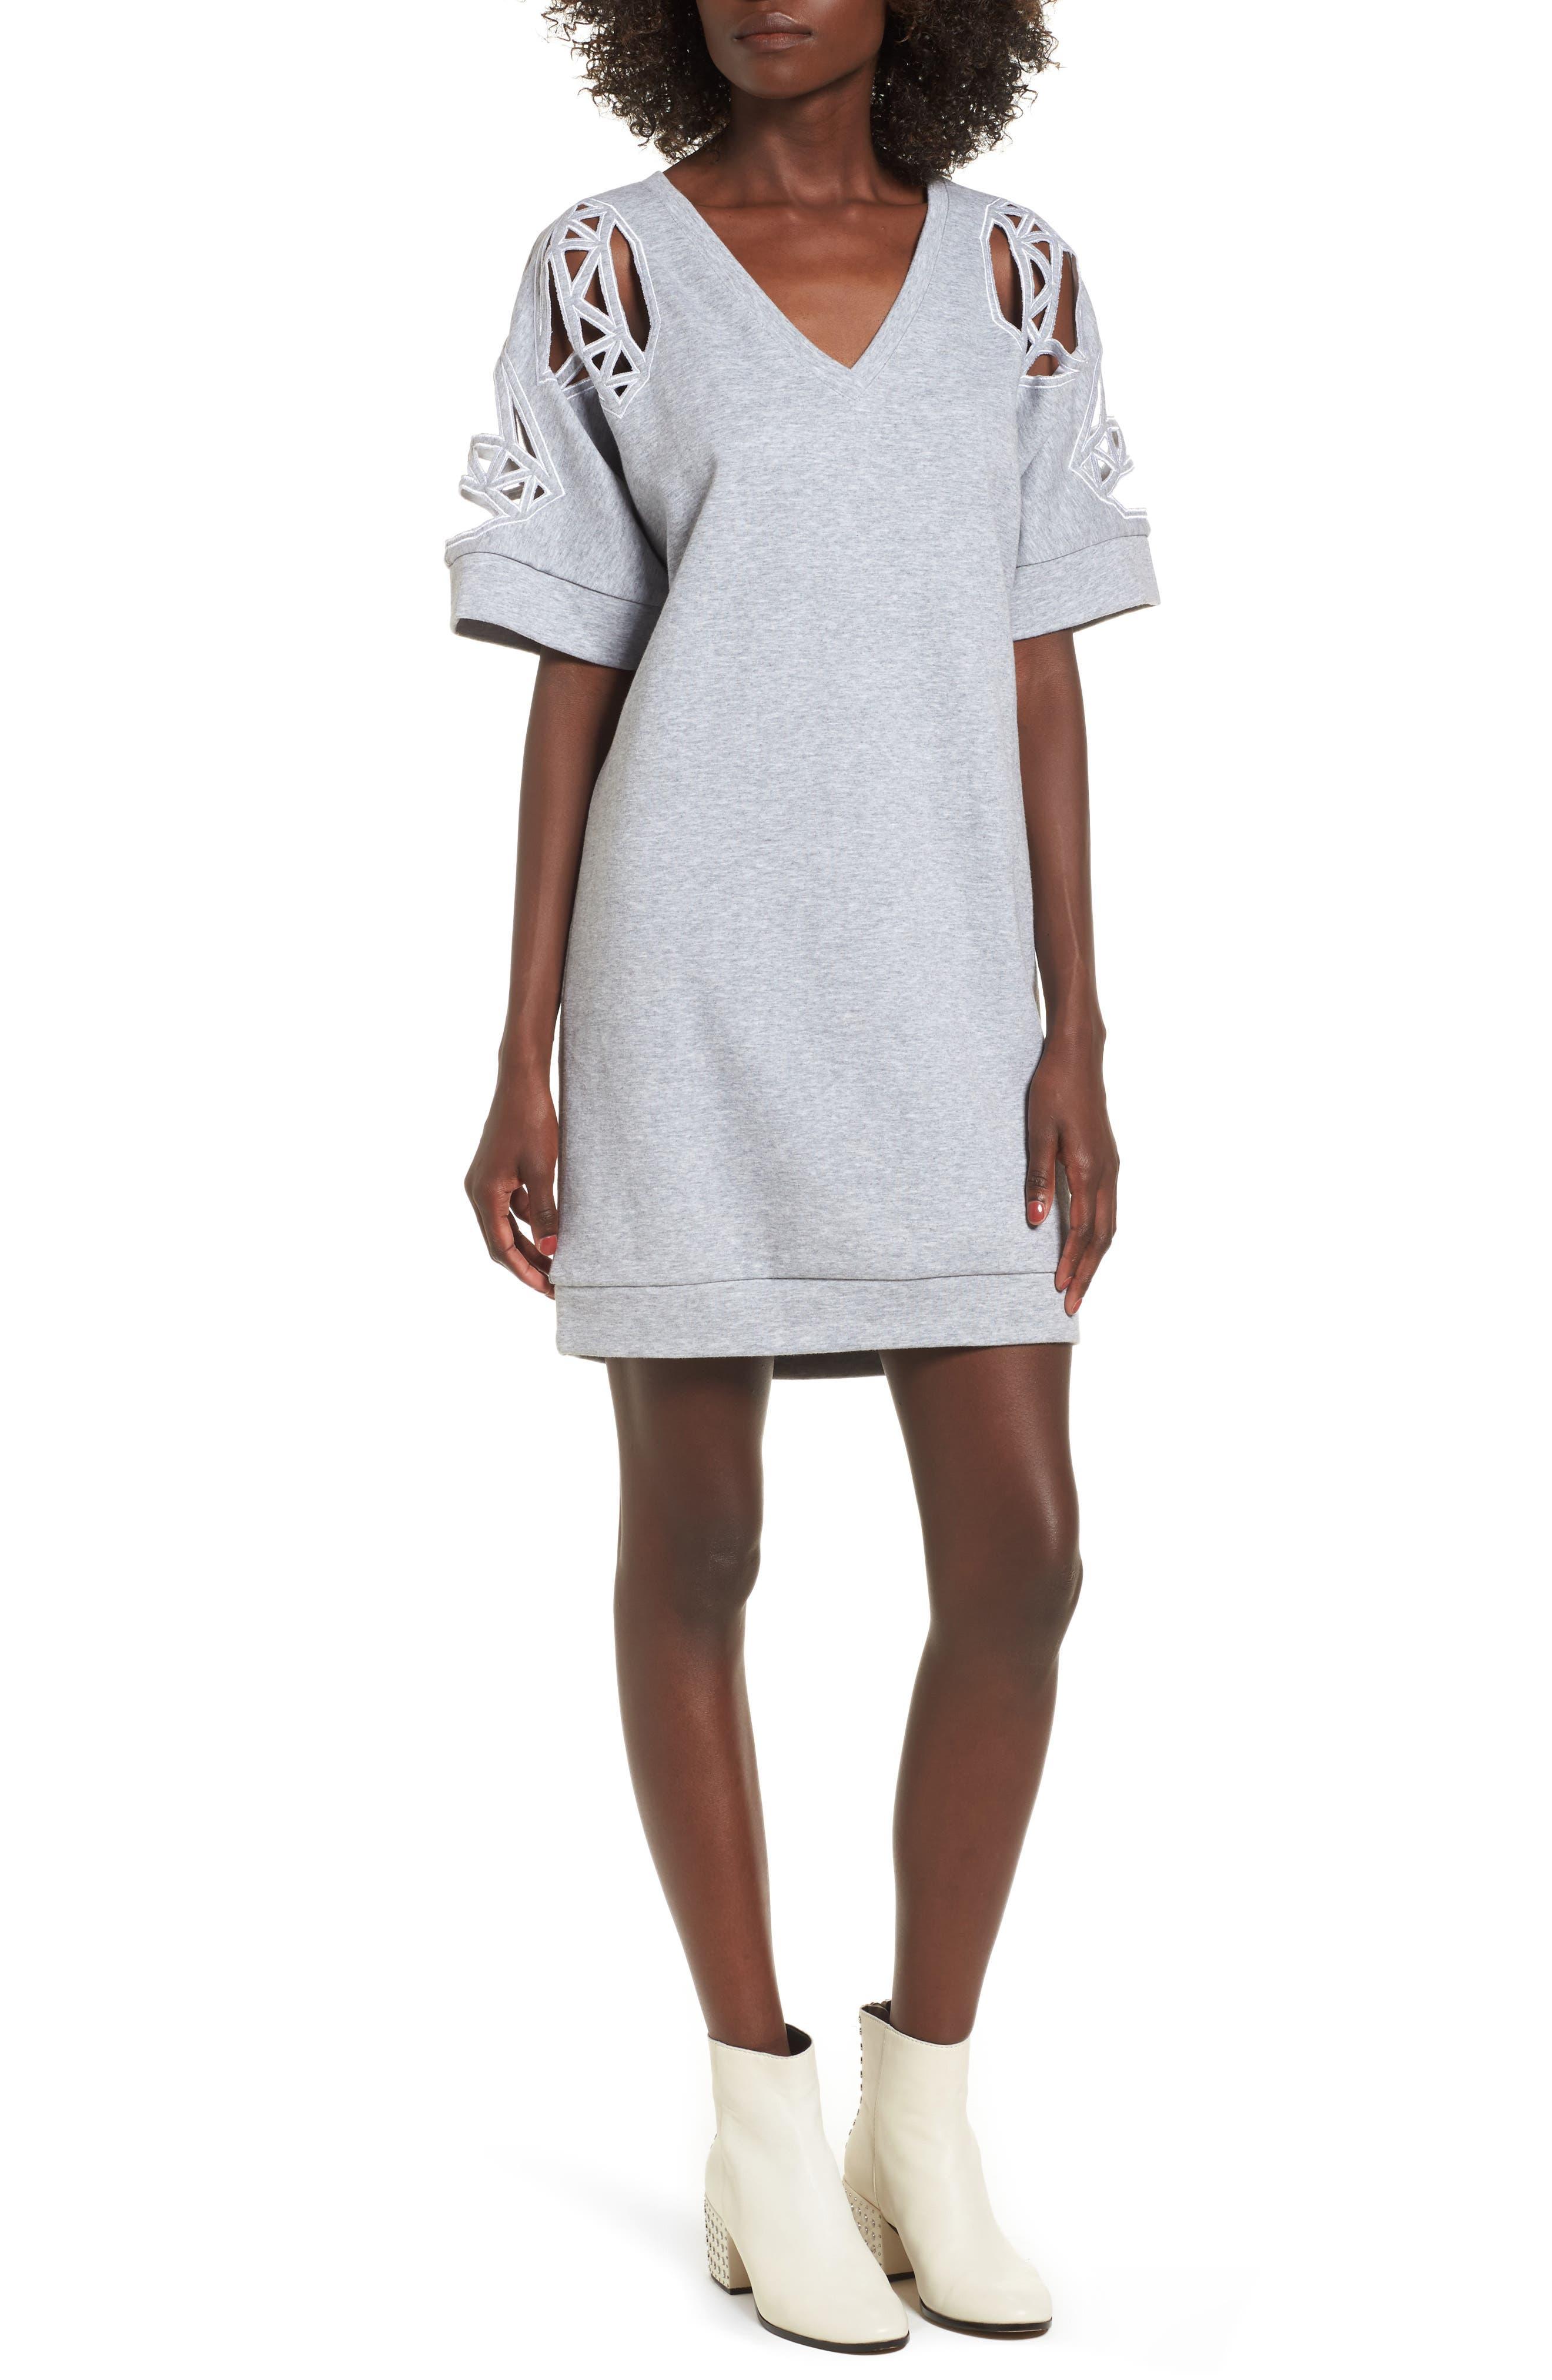 Daffic Sweatshirt Dress,                         Main,                         color, 020